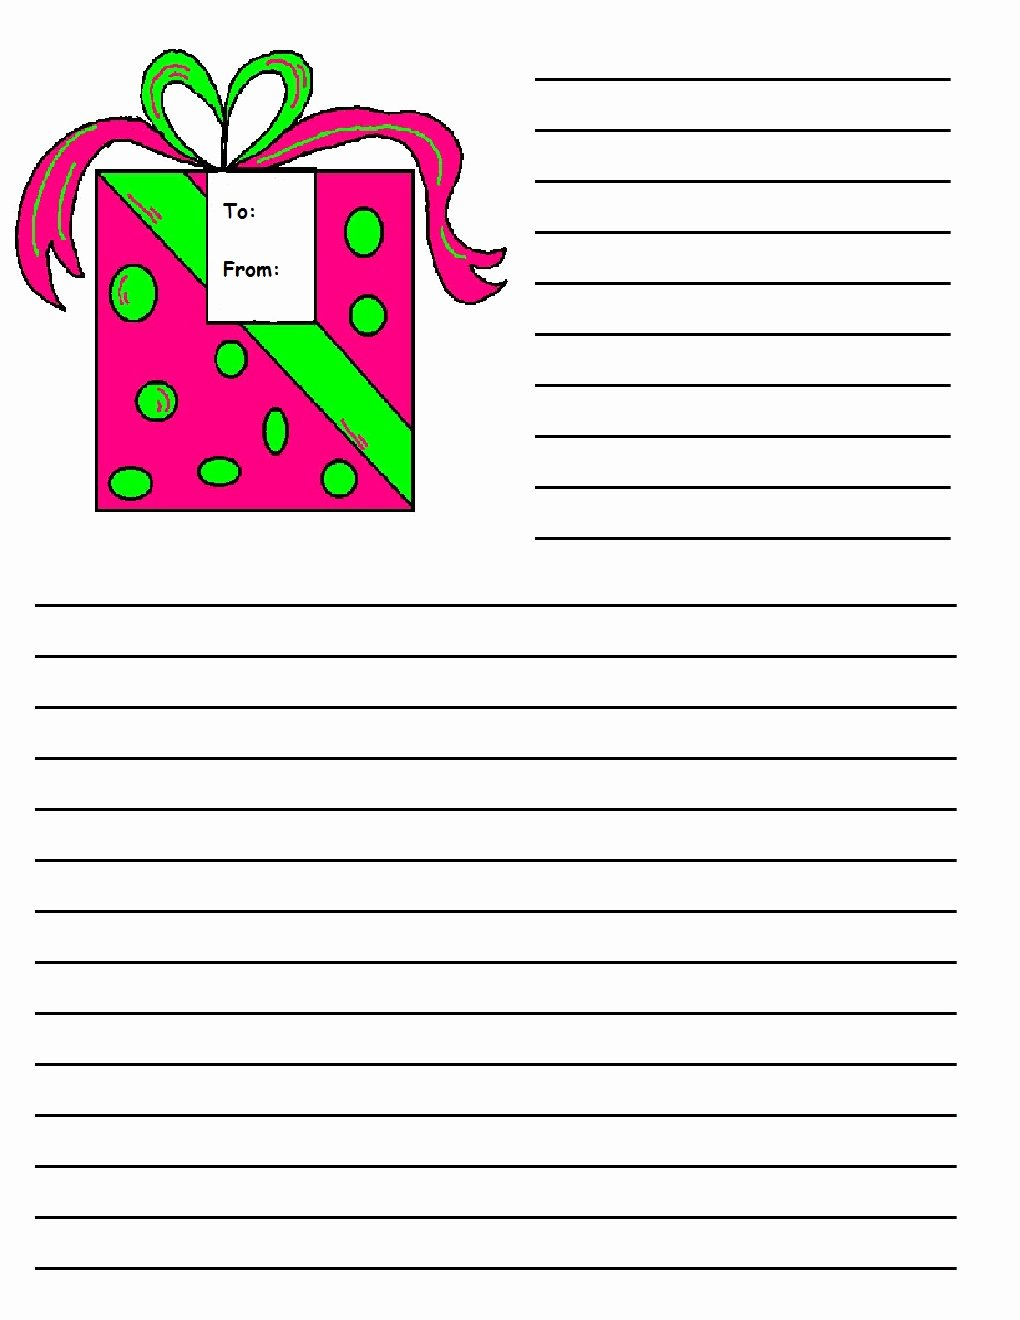 Free Printable Writing Paper Fresh Christmas Printable Writing Paper